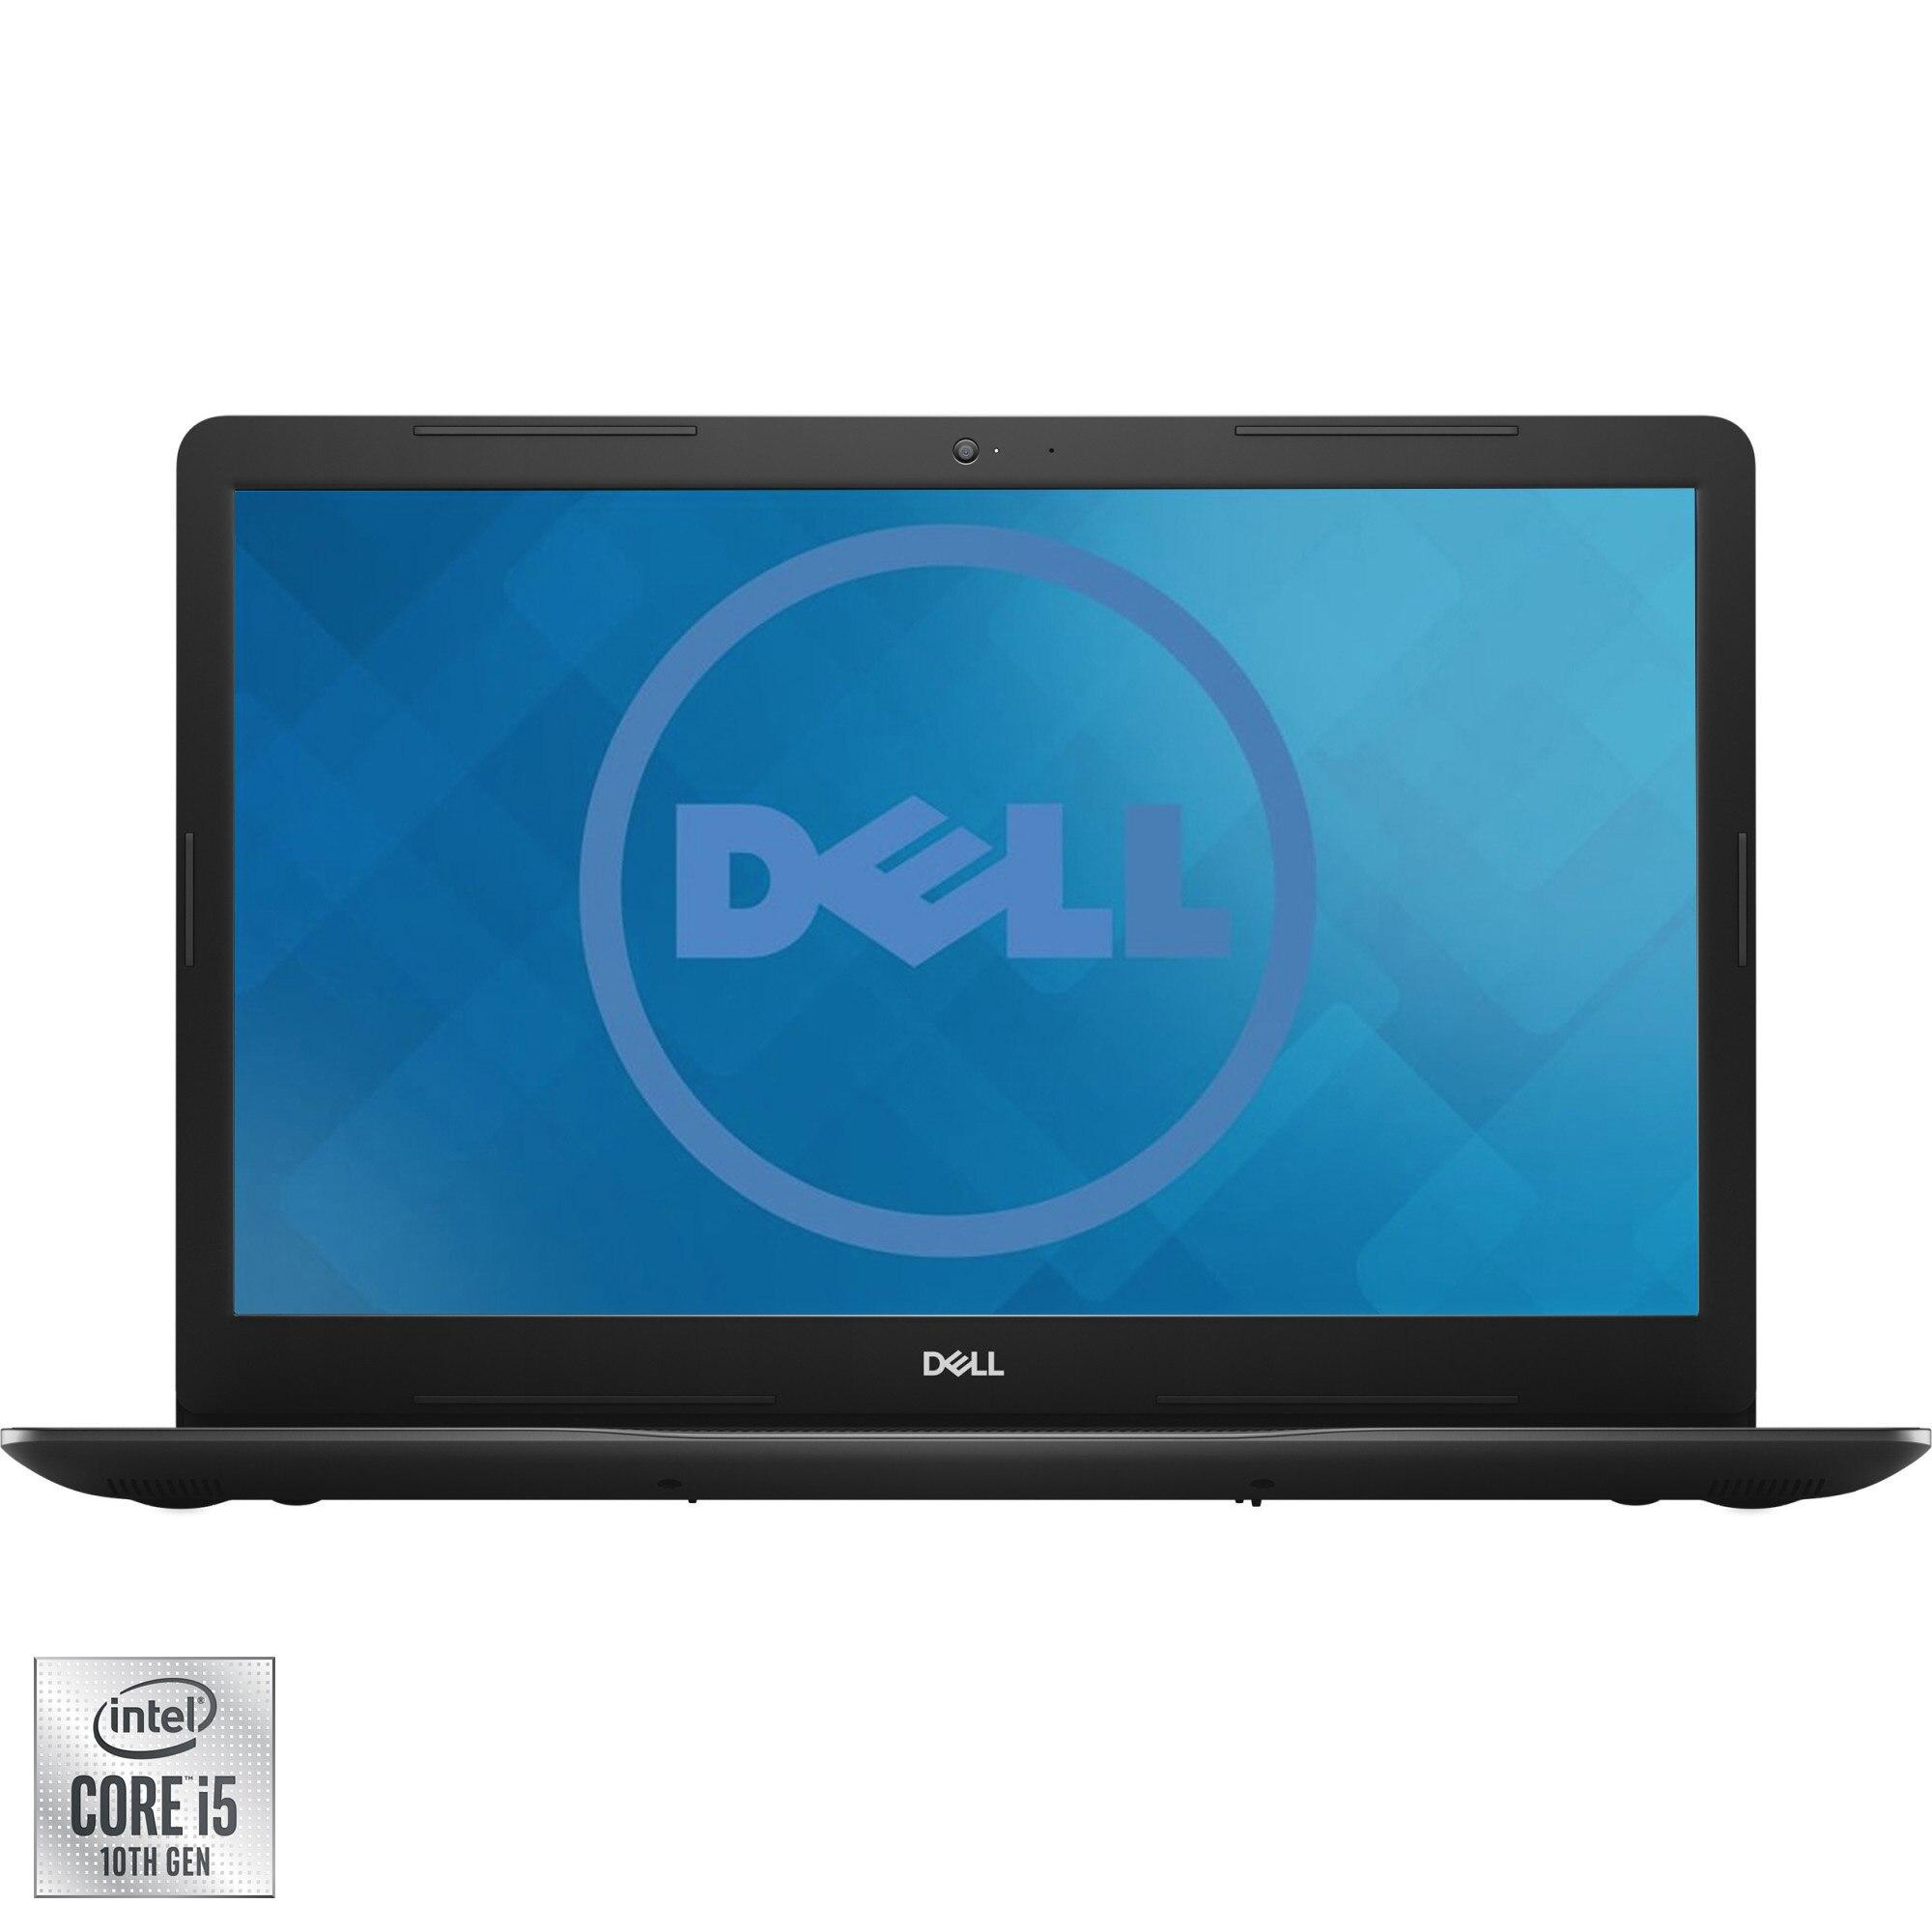 "Fotografie Laptop Dell Inspiron 3793 cu procesor Intel® Core™ i5-1035G1 pana la 3.70 GHz, 17.3"", Full HD, 8GB, 256GB SSD, NVIDIA GeForce MX230, Ubuntu, Black"